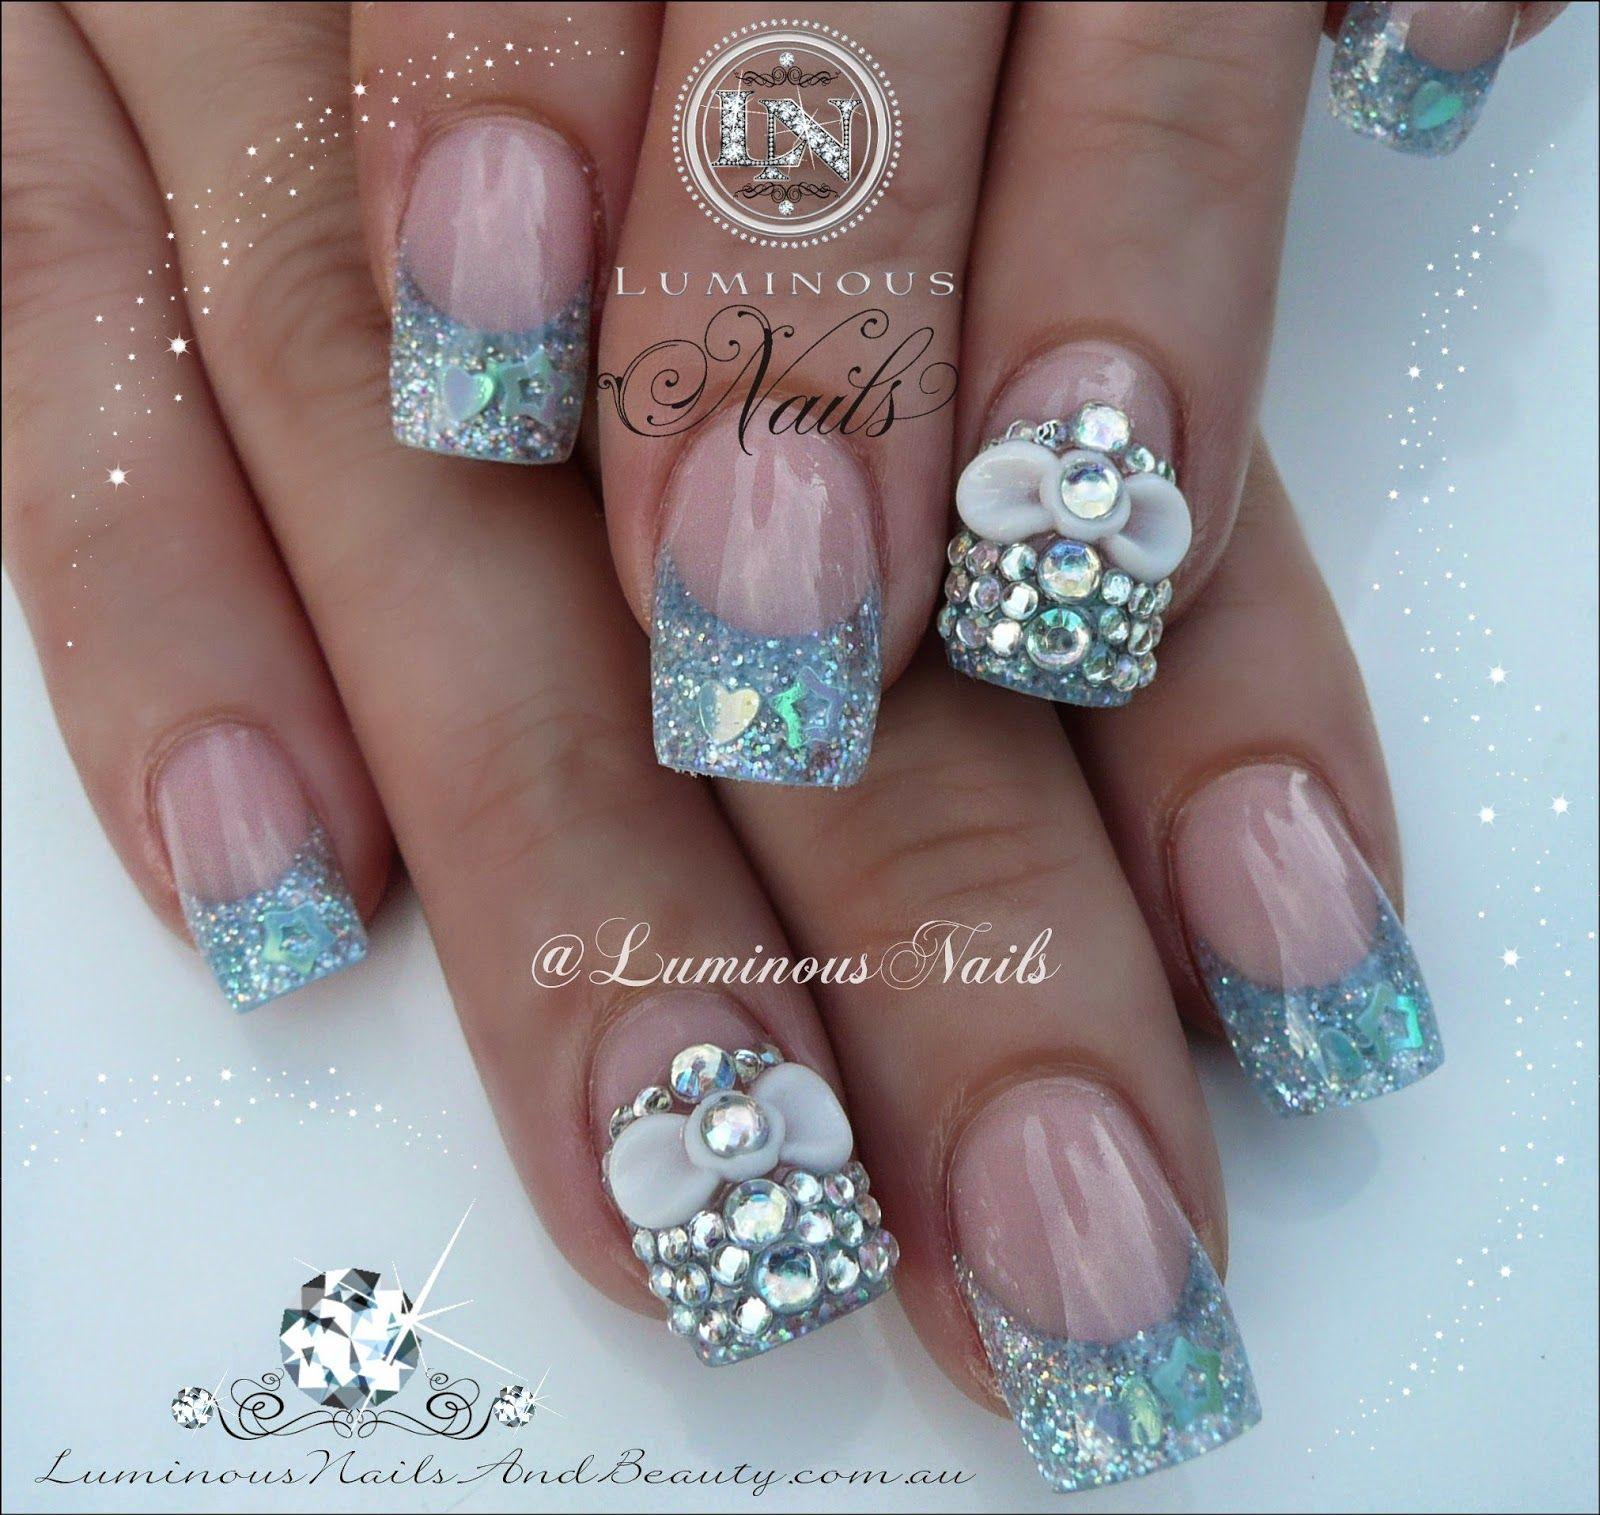 Luminous Nails Baby Blue Nails With 3D Bows & Bling